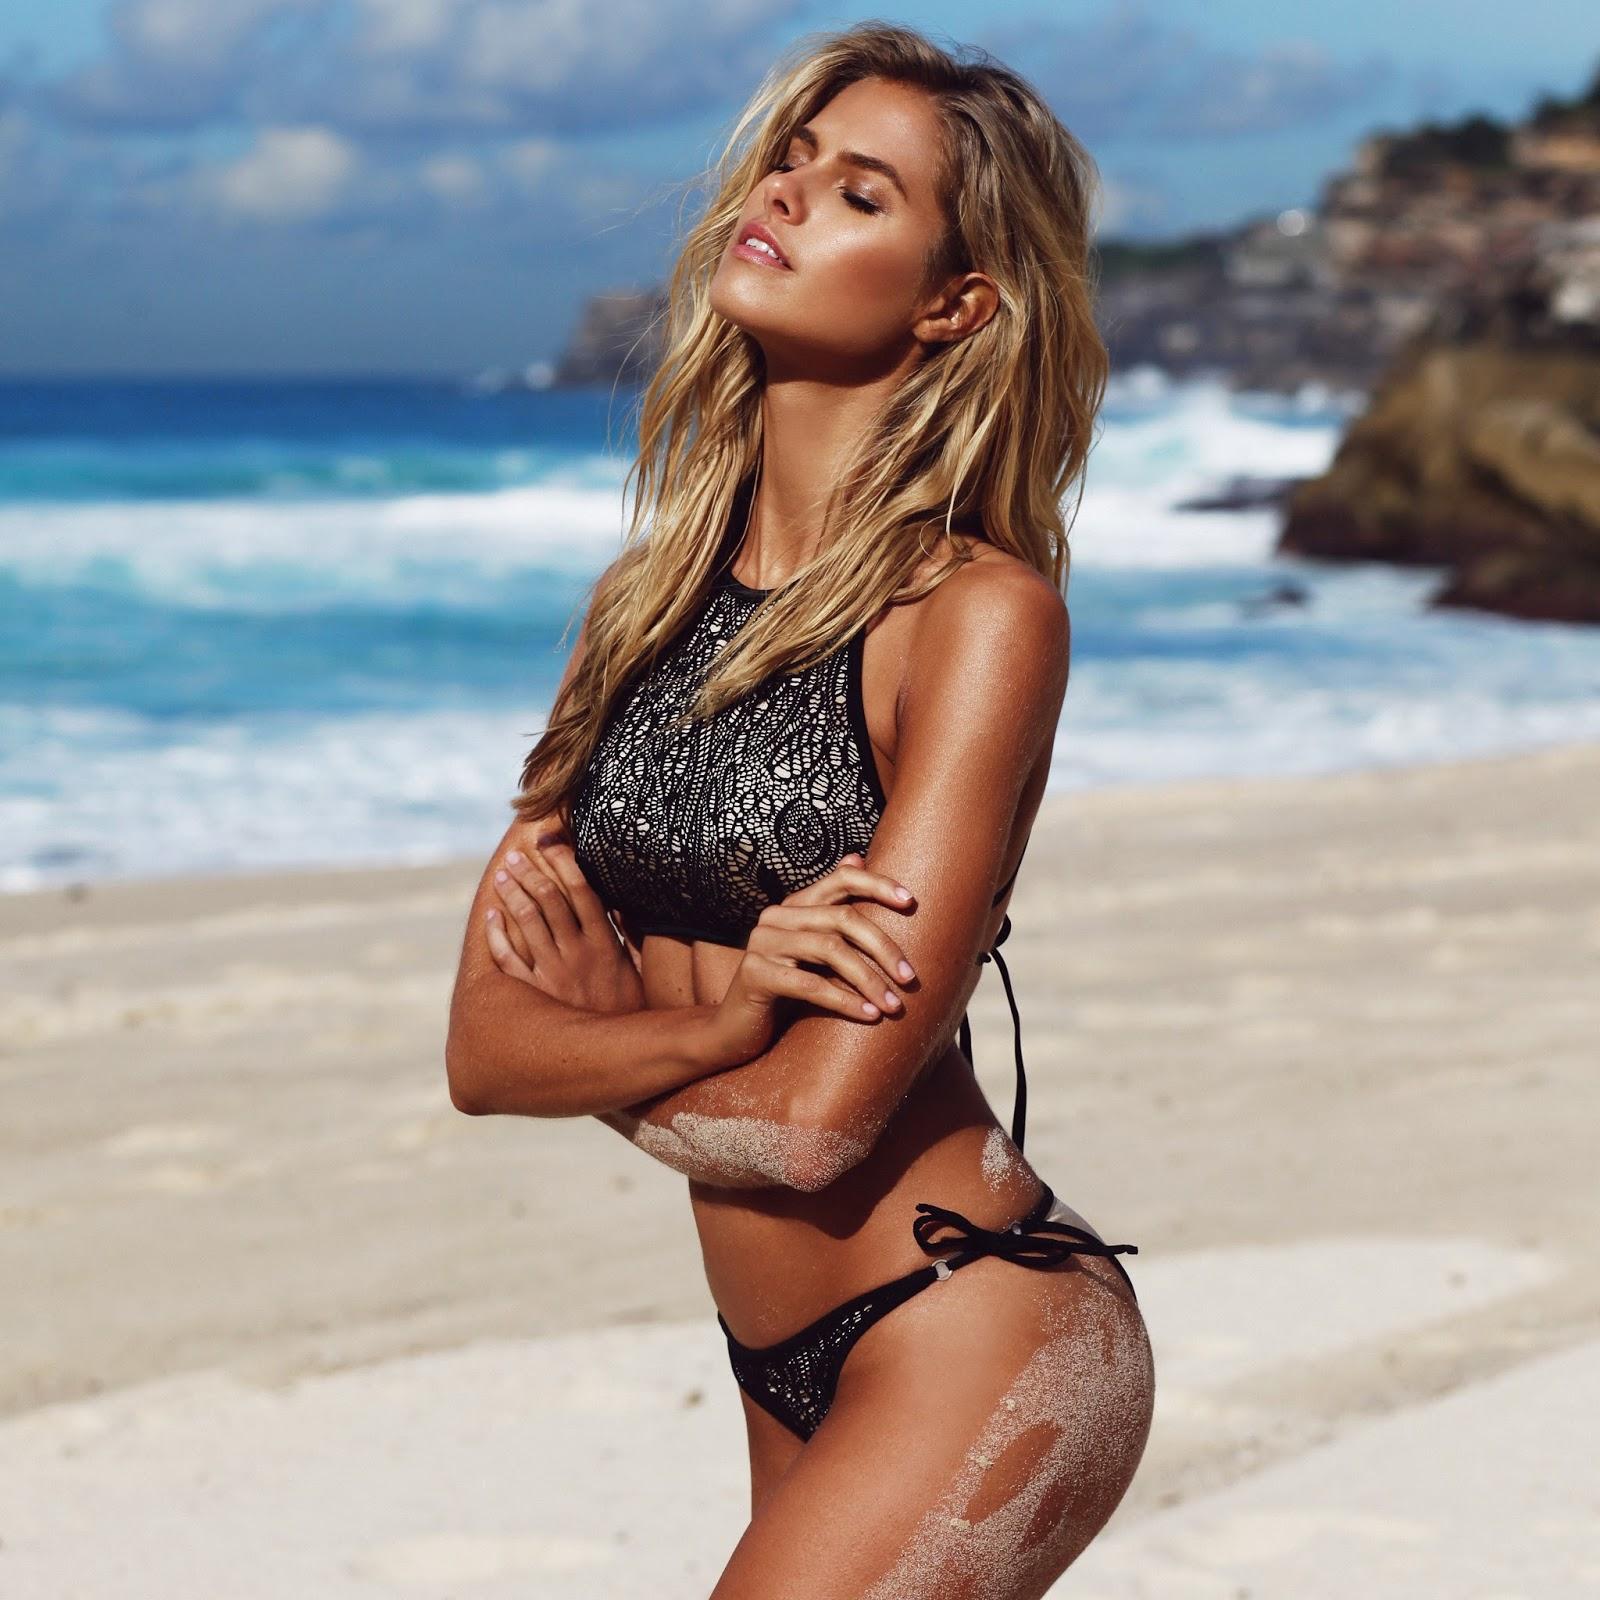 Hot Bianca Ghezzi nudes (93 photo), Tits, Paparazzi, Boobs, lingerie 2020